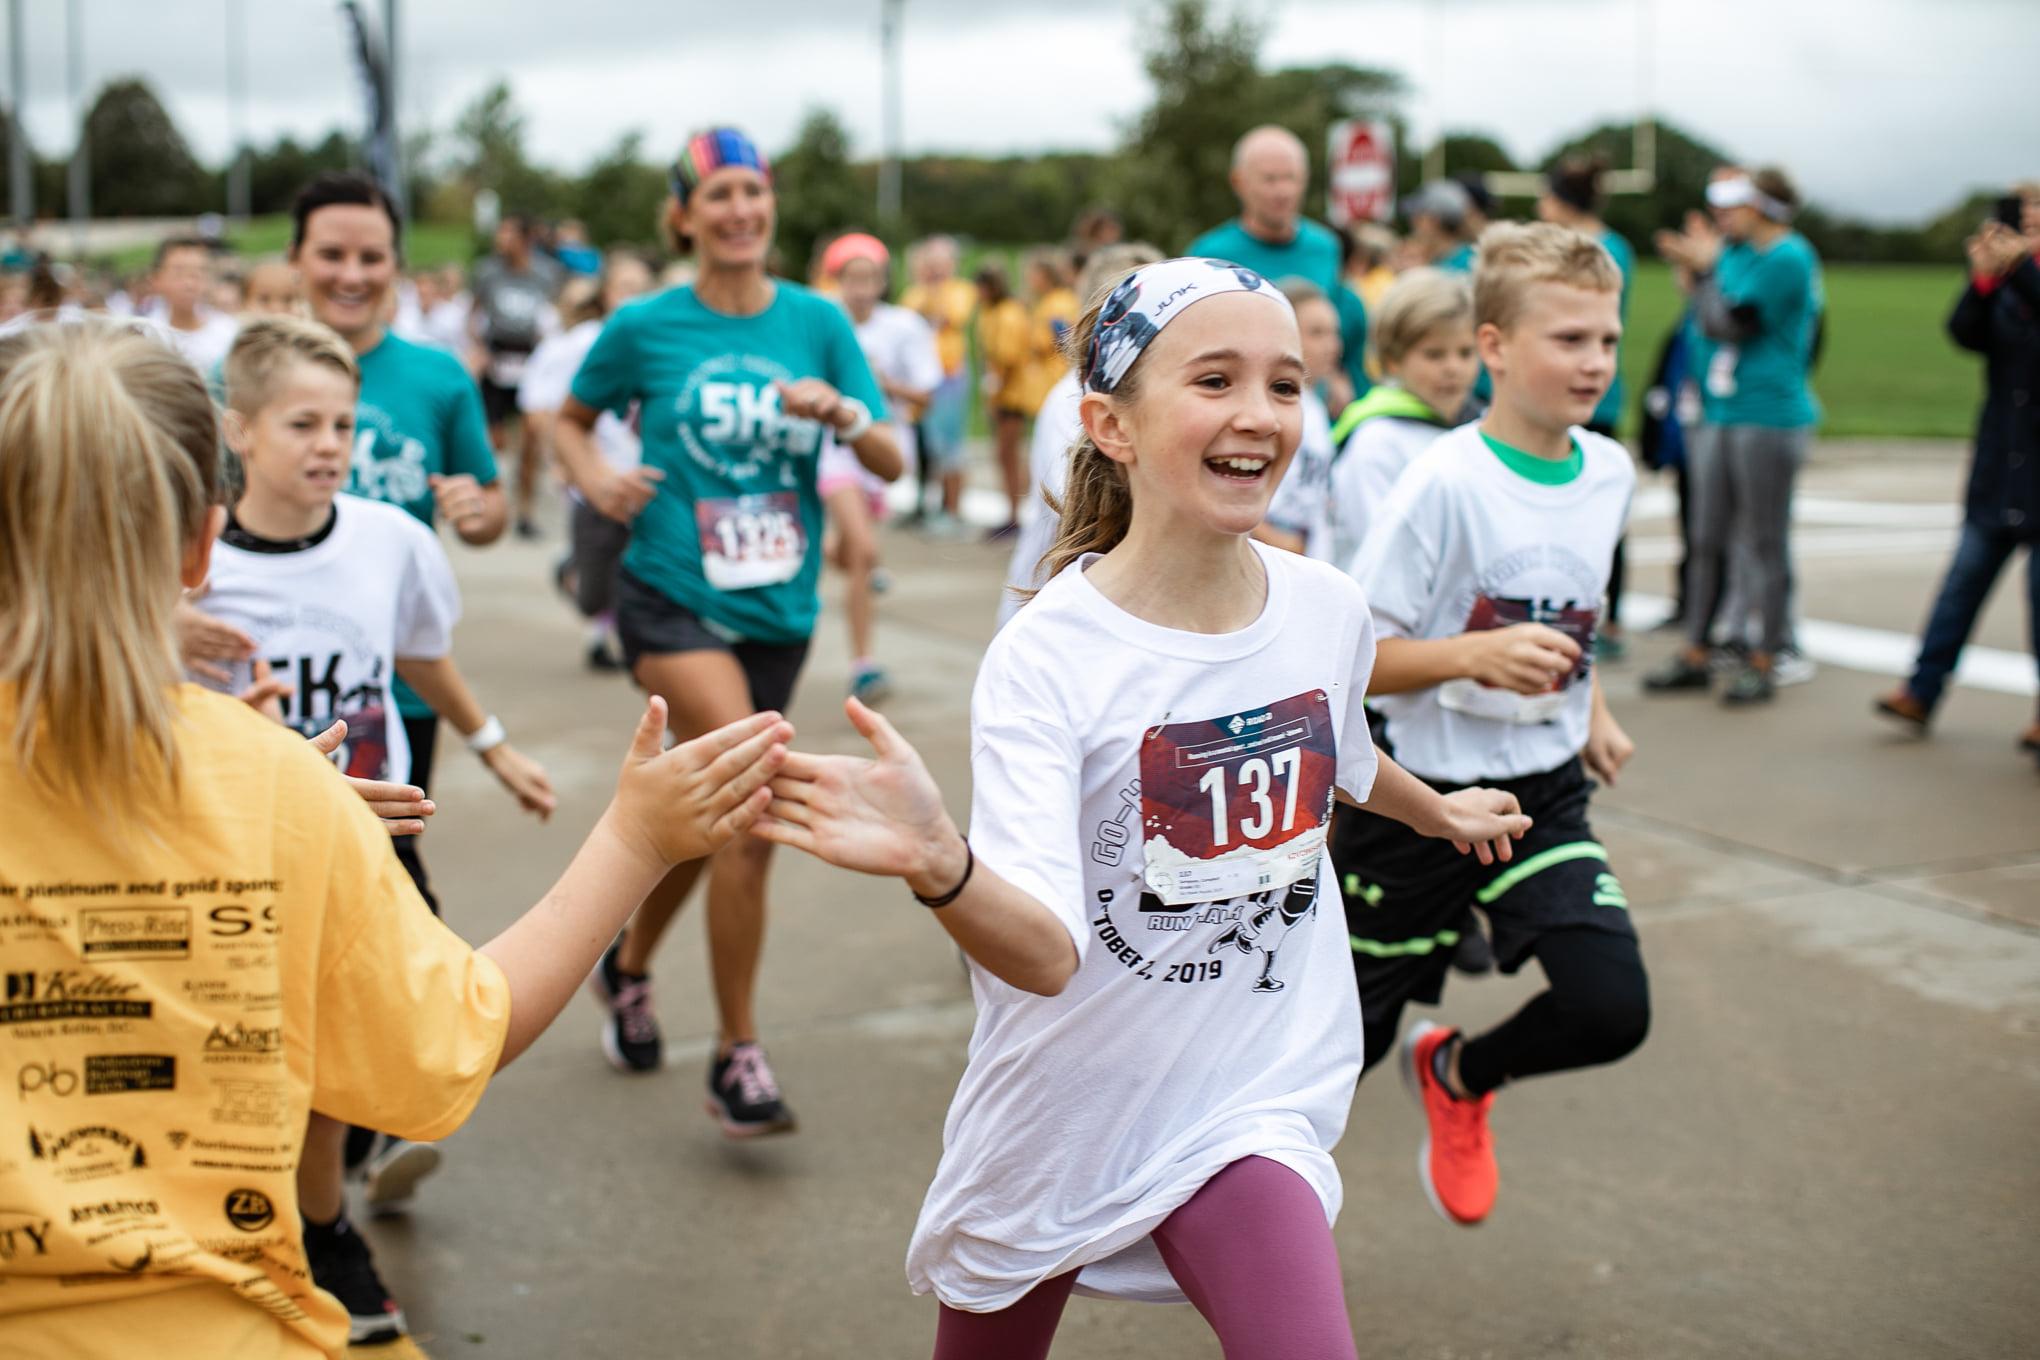 Middle School 5K run 2019-20